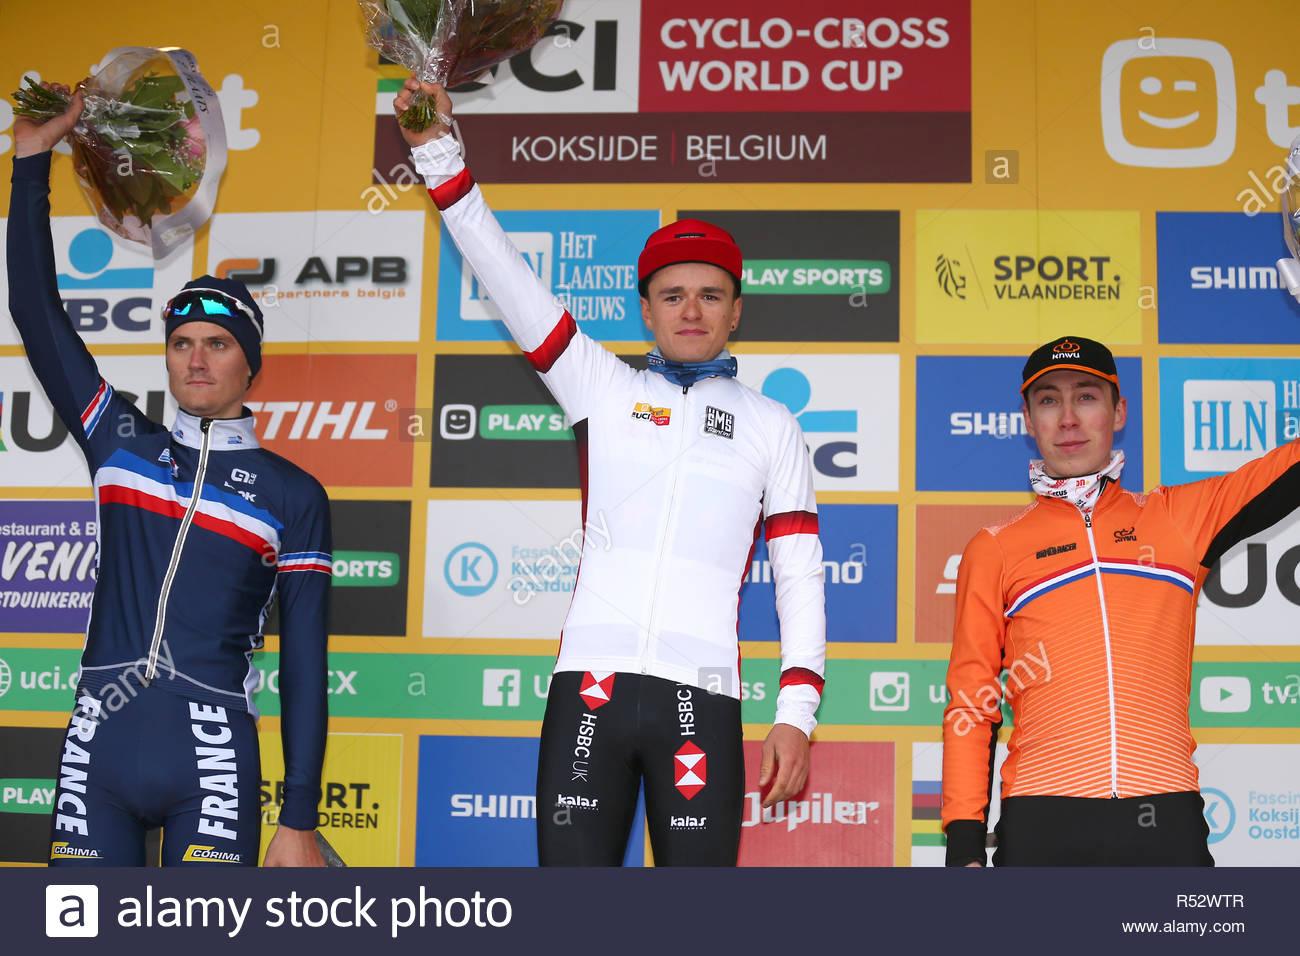 Koksijde Belgium 25 November 2018 World Cup Cyclecross L R